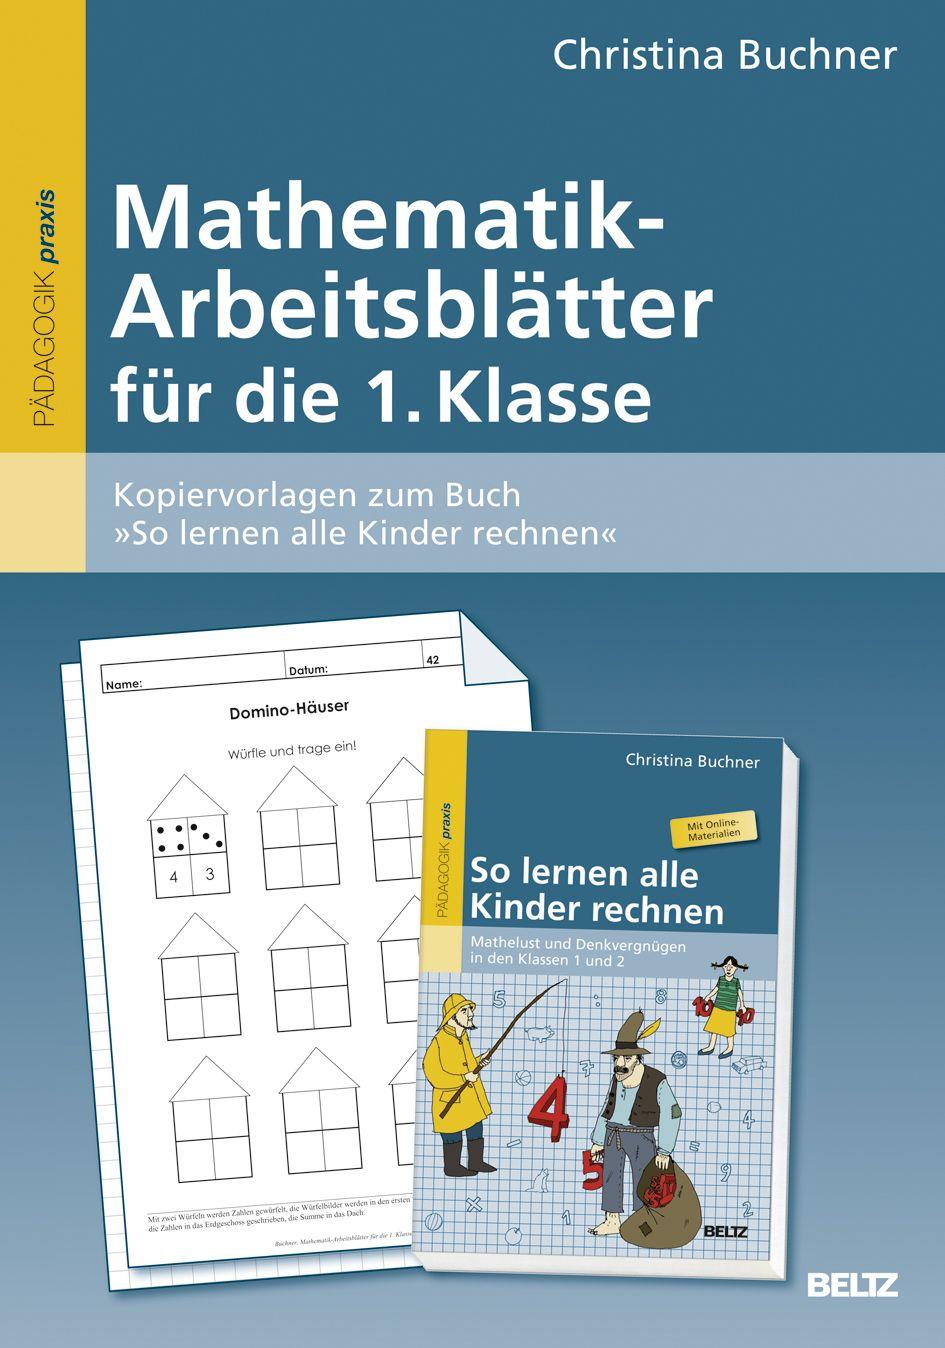 Niedlich Star Wars Mathe Arbeitsblatt Galerie - Mathe Arbeitsblatt ...